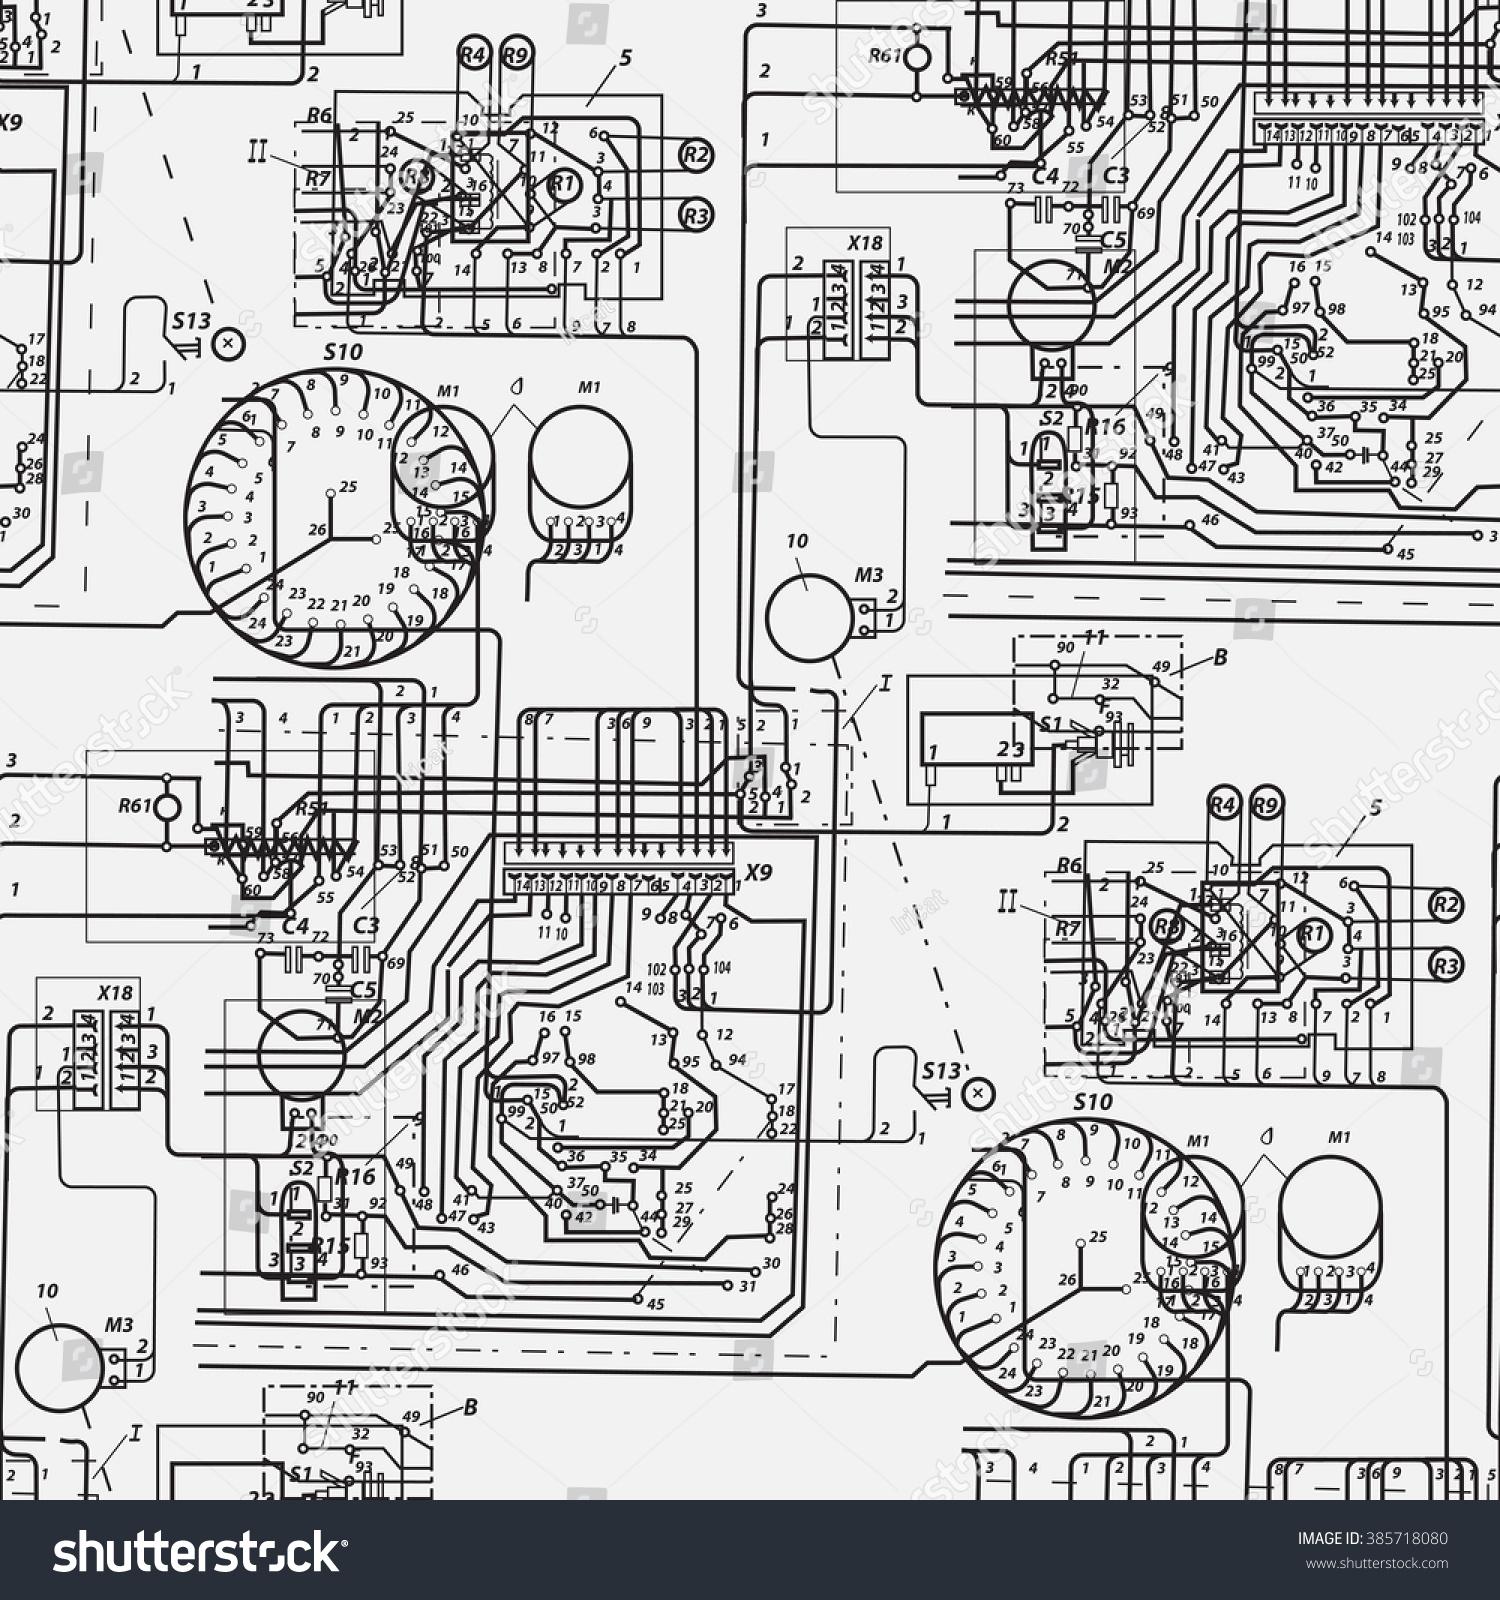 Arctic Fox Wiring Diagram Schematic Diagrams Camper Art Example Electrical U2022 Brake Light